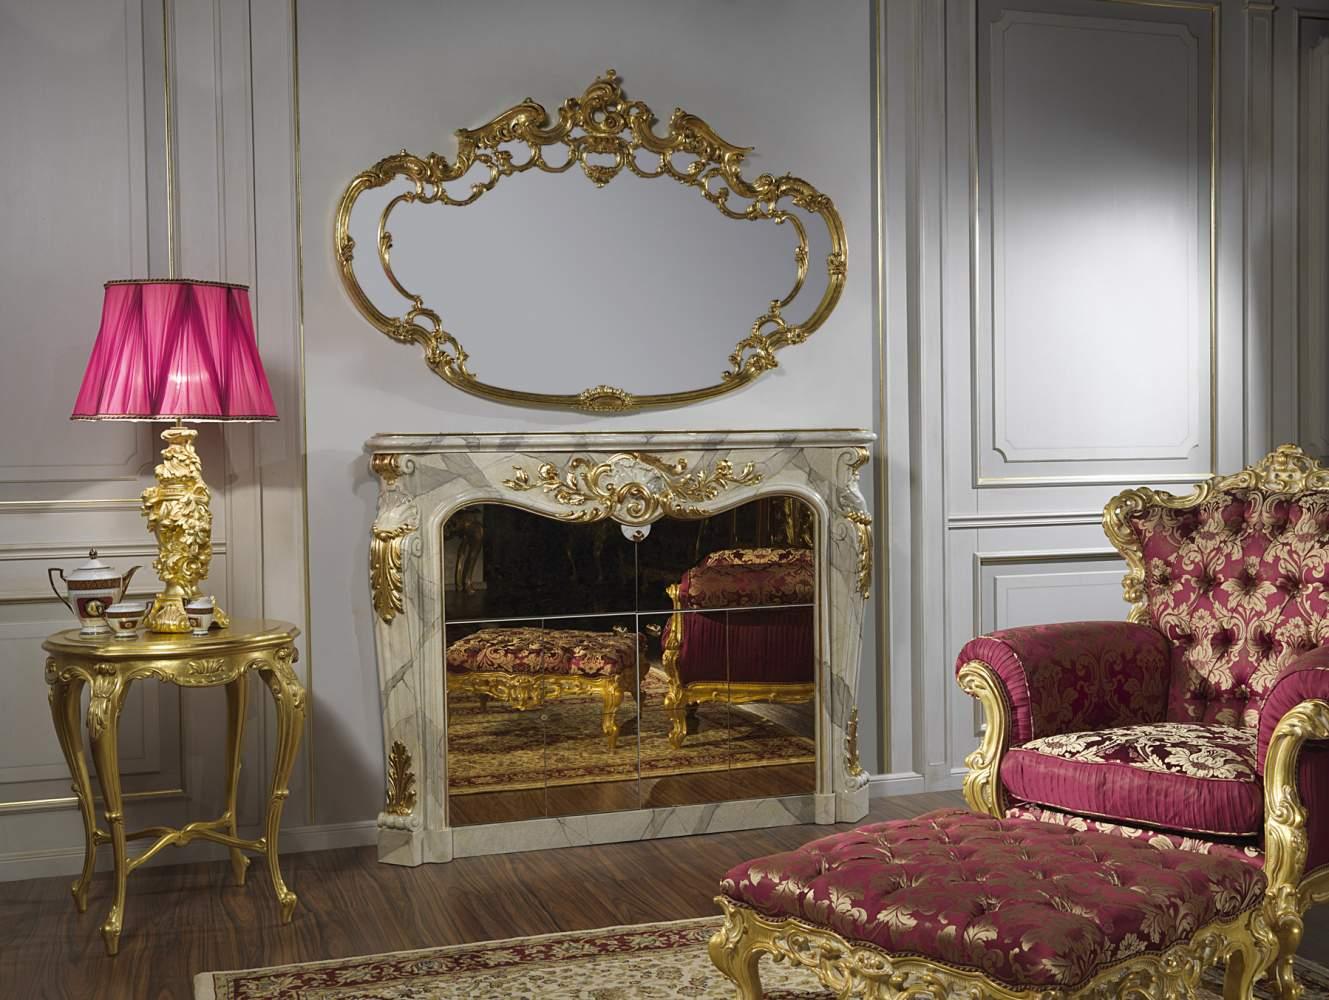 Furniture living room baroque: fireplace bar